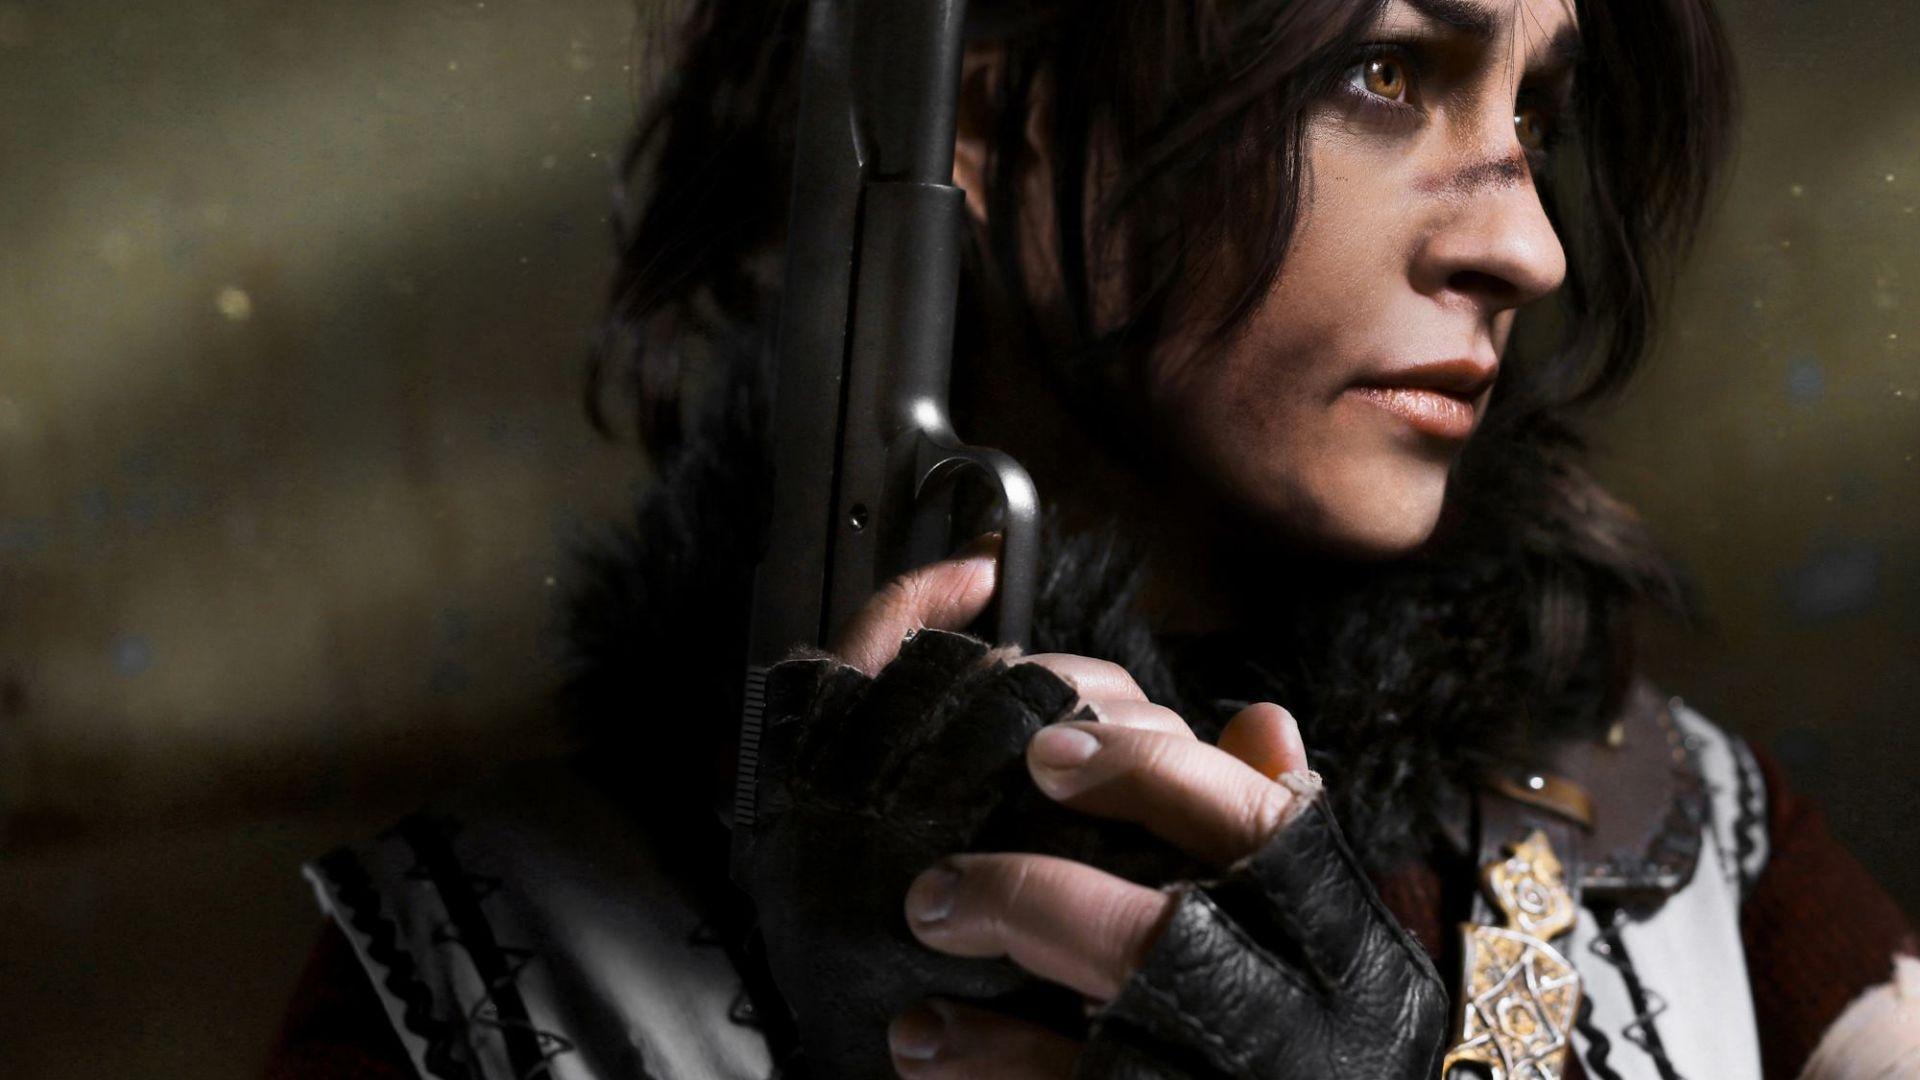 Wallpaper Tomb Raider video game, Lara Croft, Tomb Raider, cosplay, gun